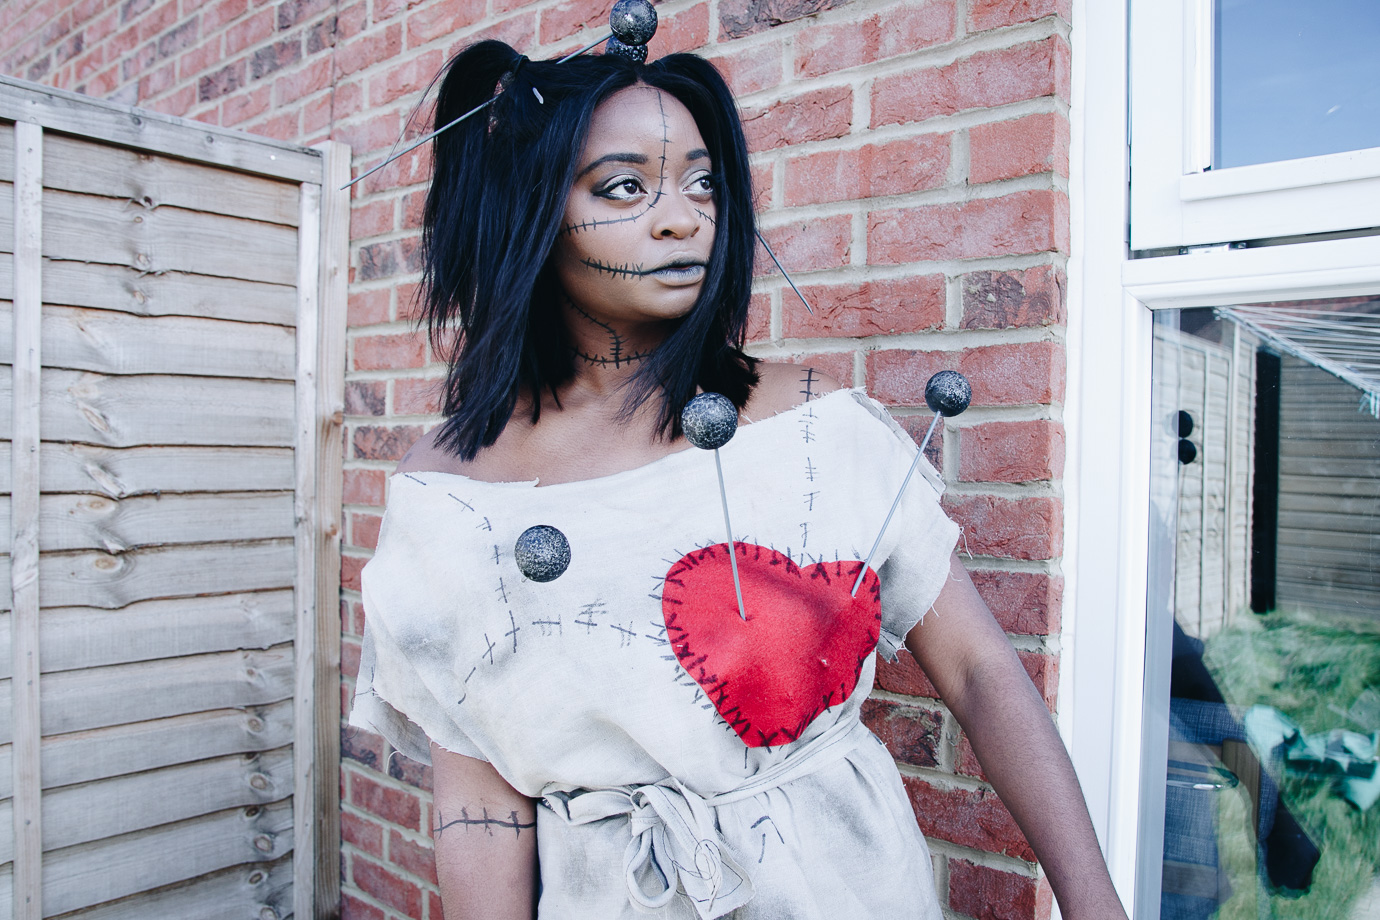 halloween: diy voodoo doll - the crafterpreneur